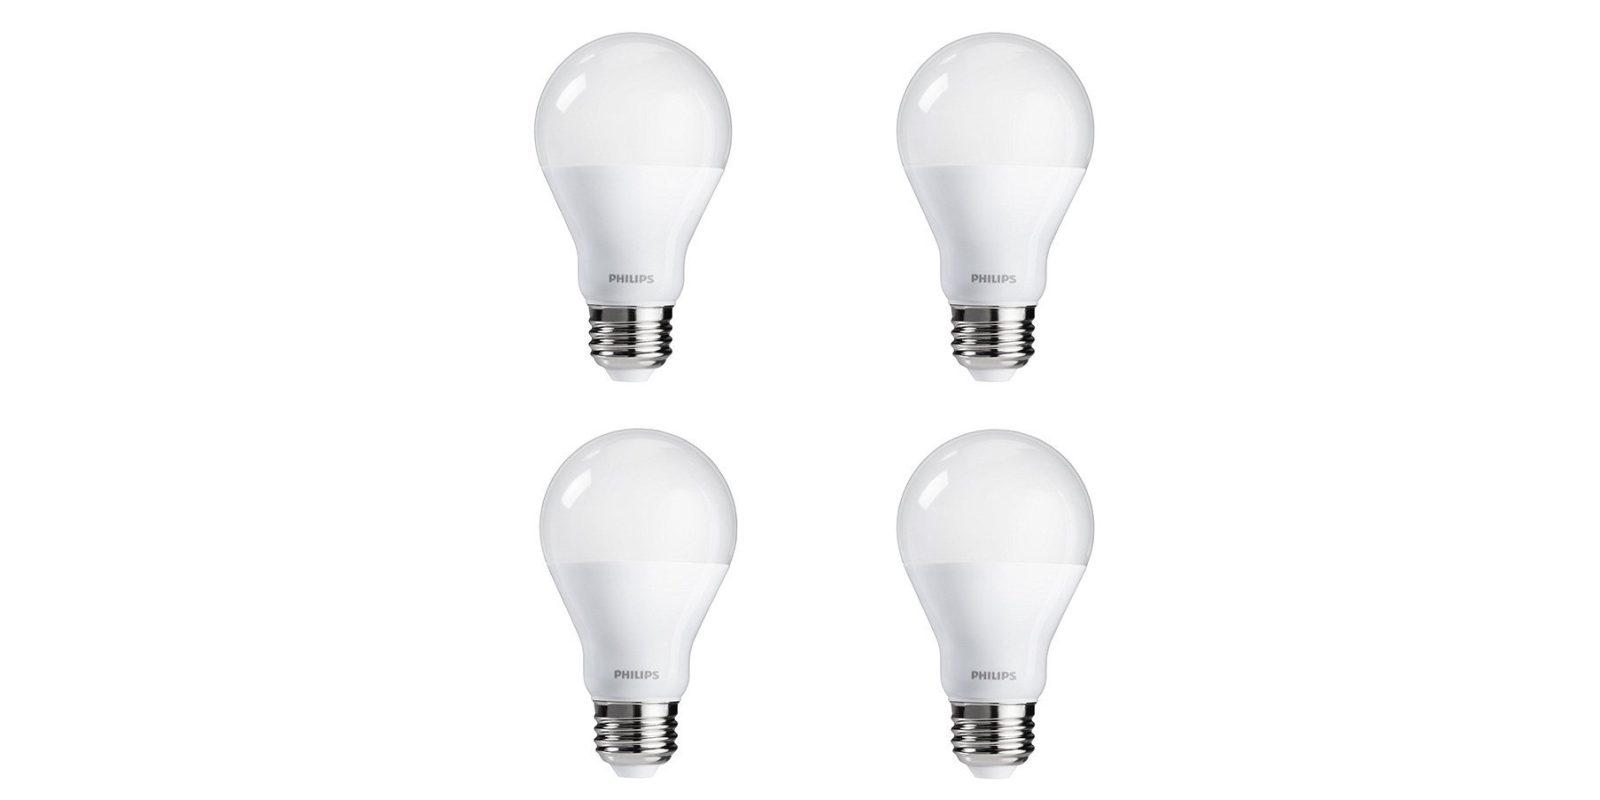 Green Deals: 4-pack Philips 100W A19 Daylight LED Light Bulbs $16 ...